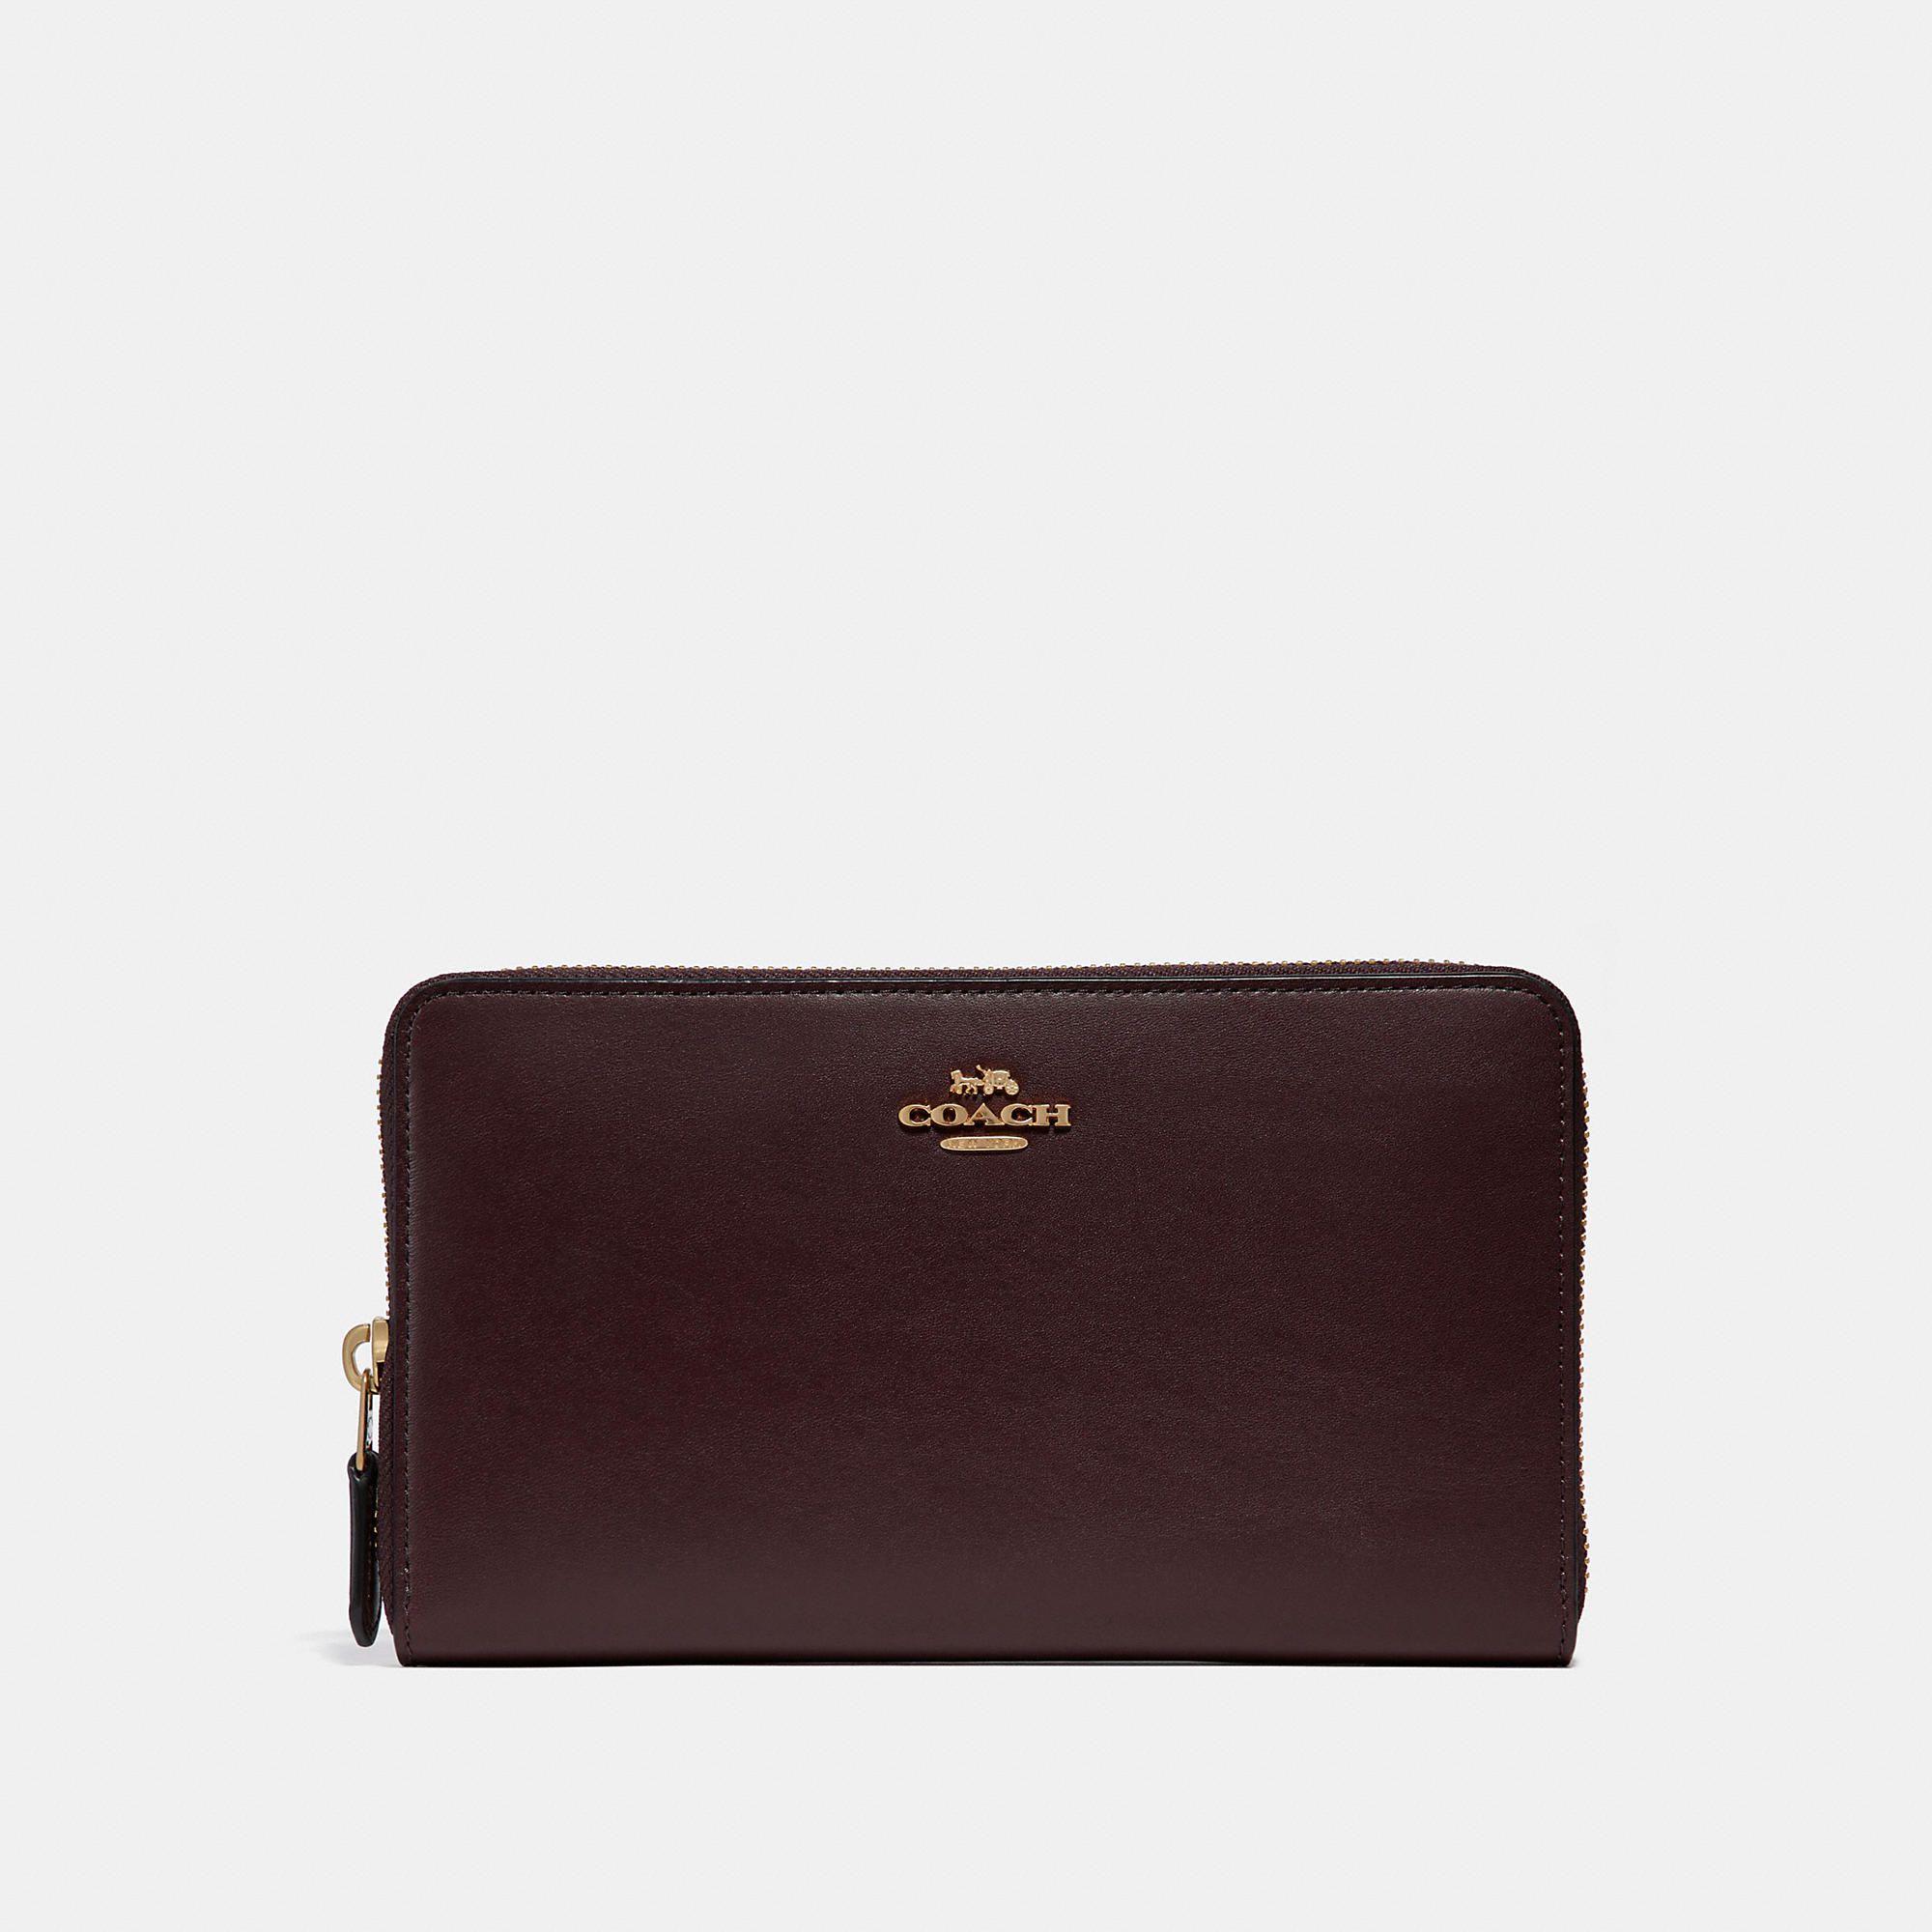 a6bdc64106c7 COACH Continental Wallet - Women s Large Wallets